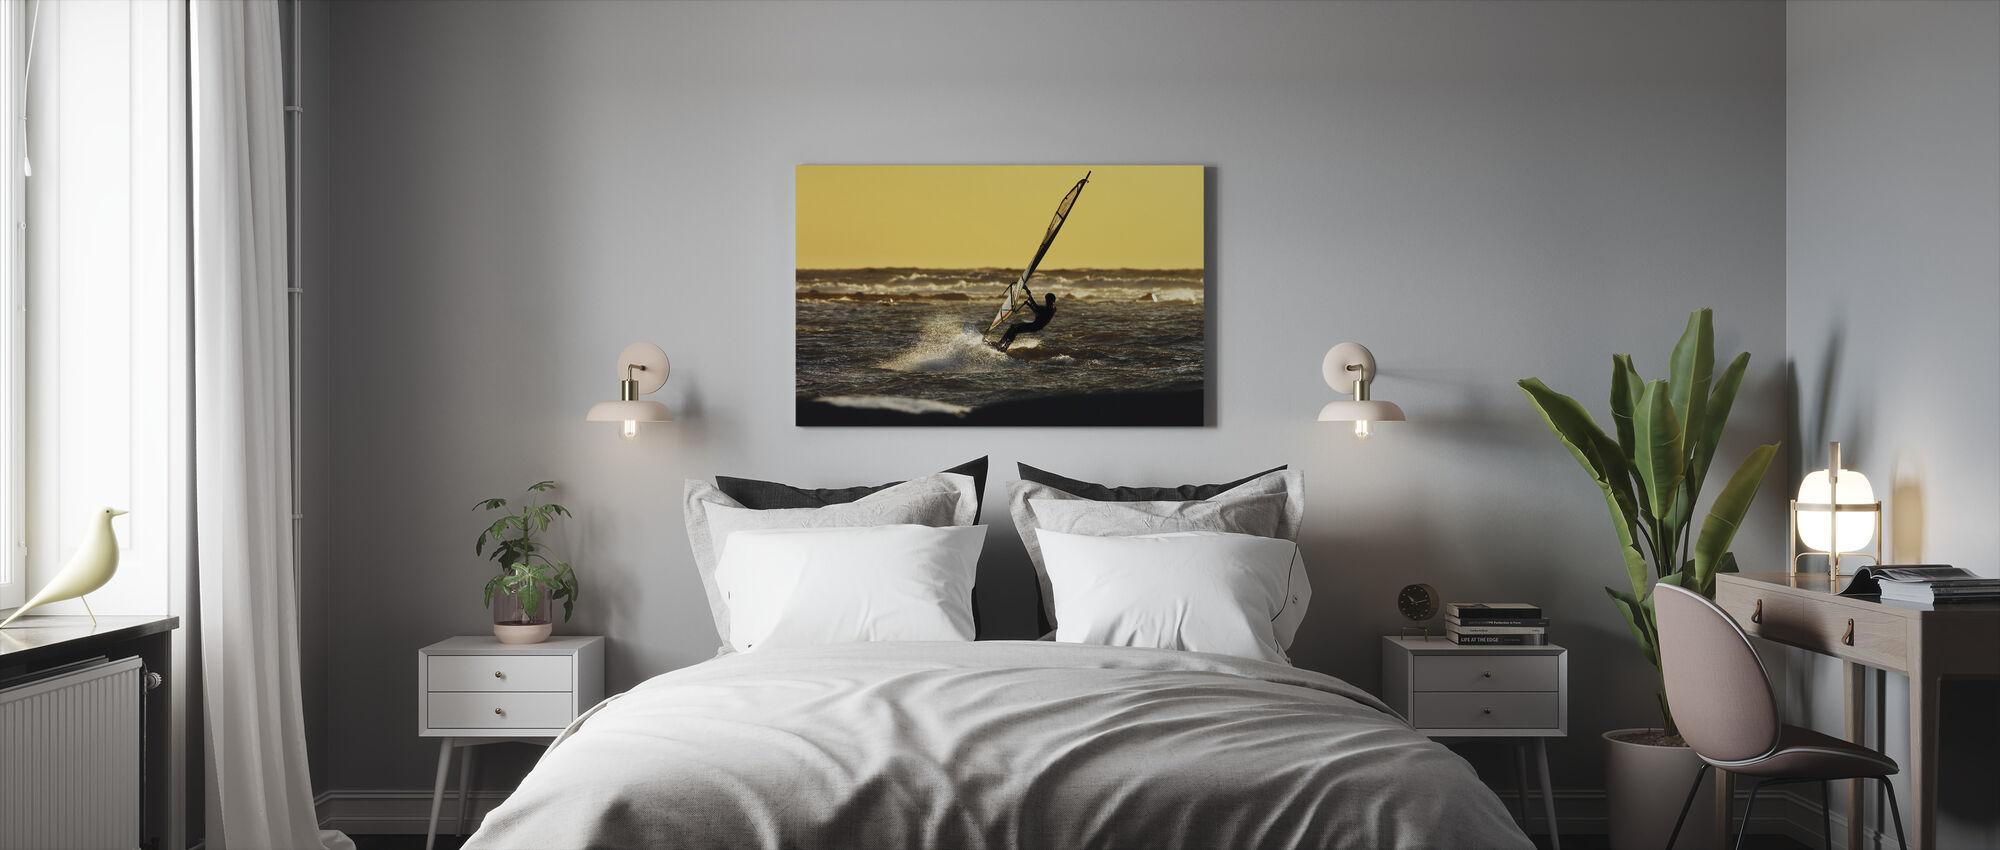 Windsurfen - Leinwandbild - Schlafzimmer